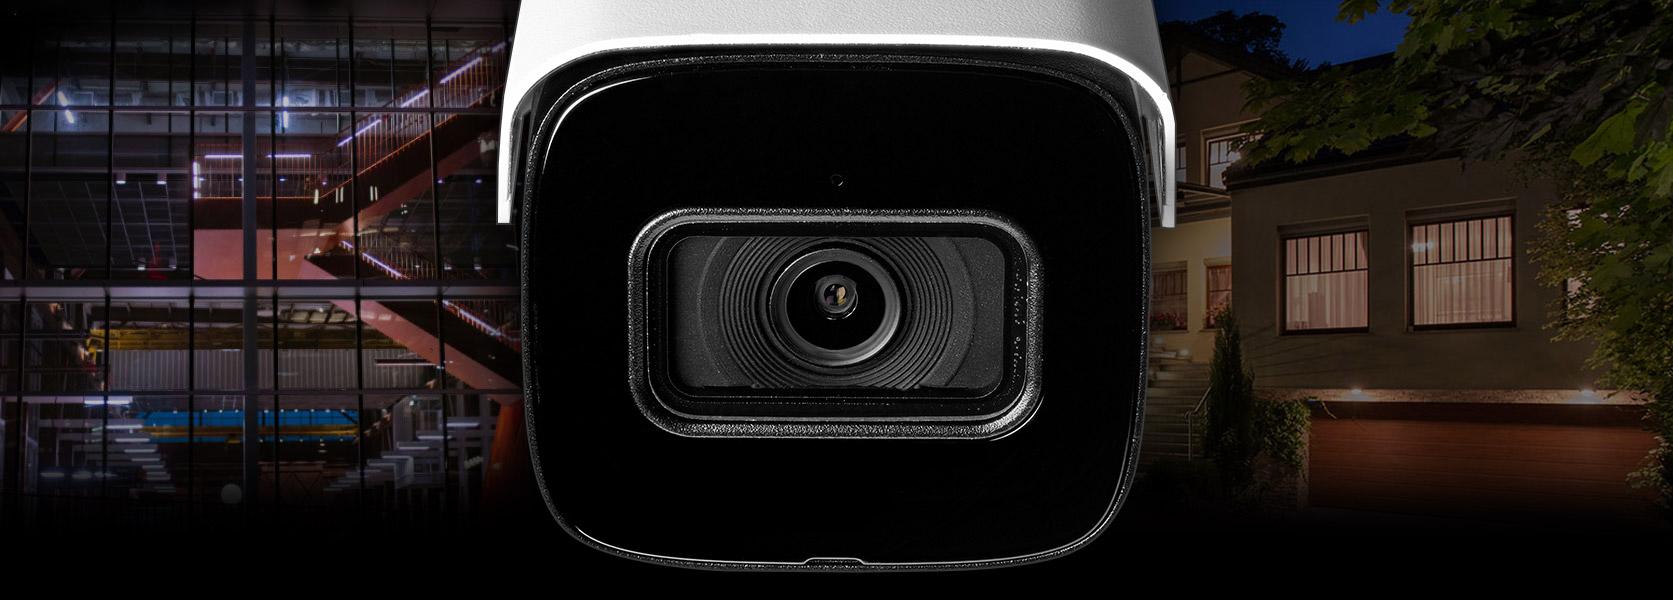 LNB9252B 4K Nocturnal camera